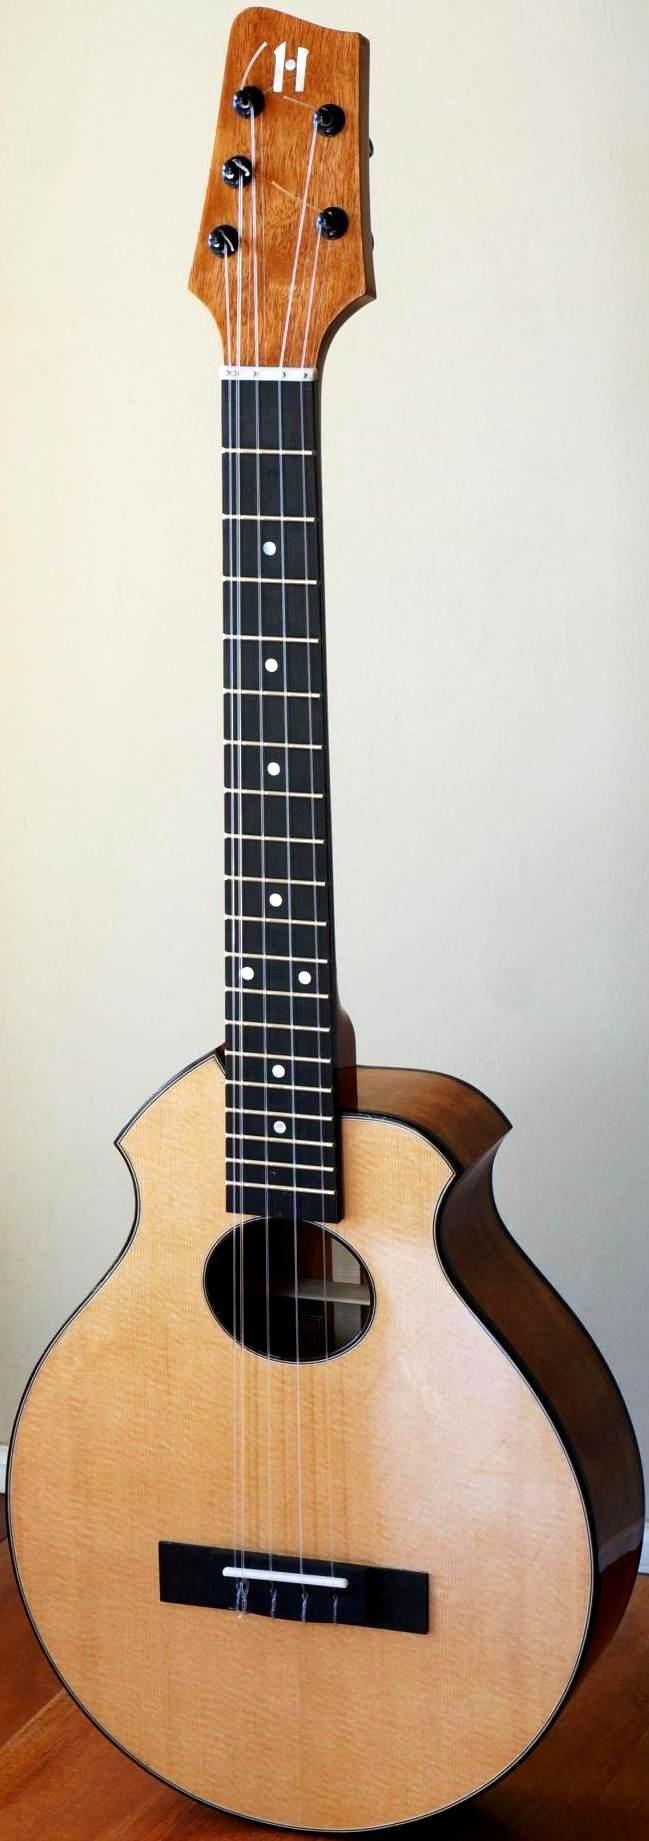 Hoffmann M Series Double G Tenor Https Www Pinterest Com Lardyfatboy Ukulele Classic Guitar Guitar Design